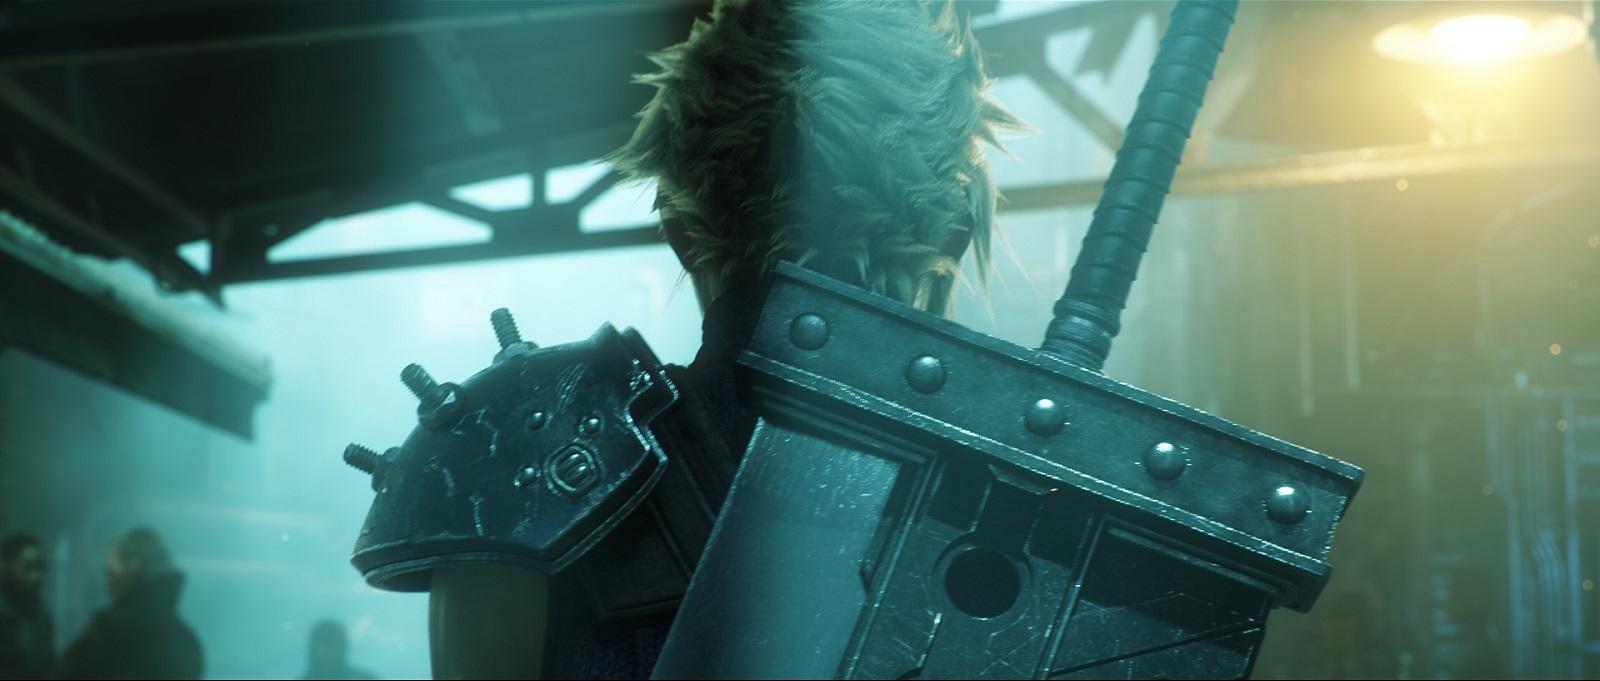 Final Fantasy VII Remake; screenshot: hrdina